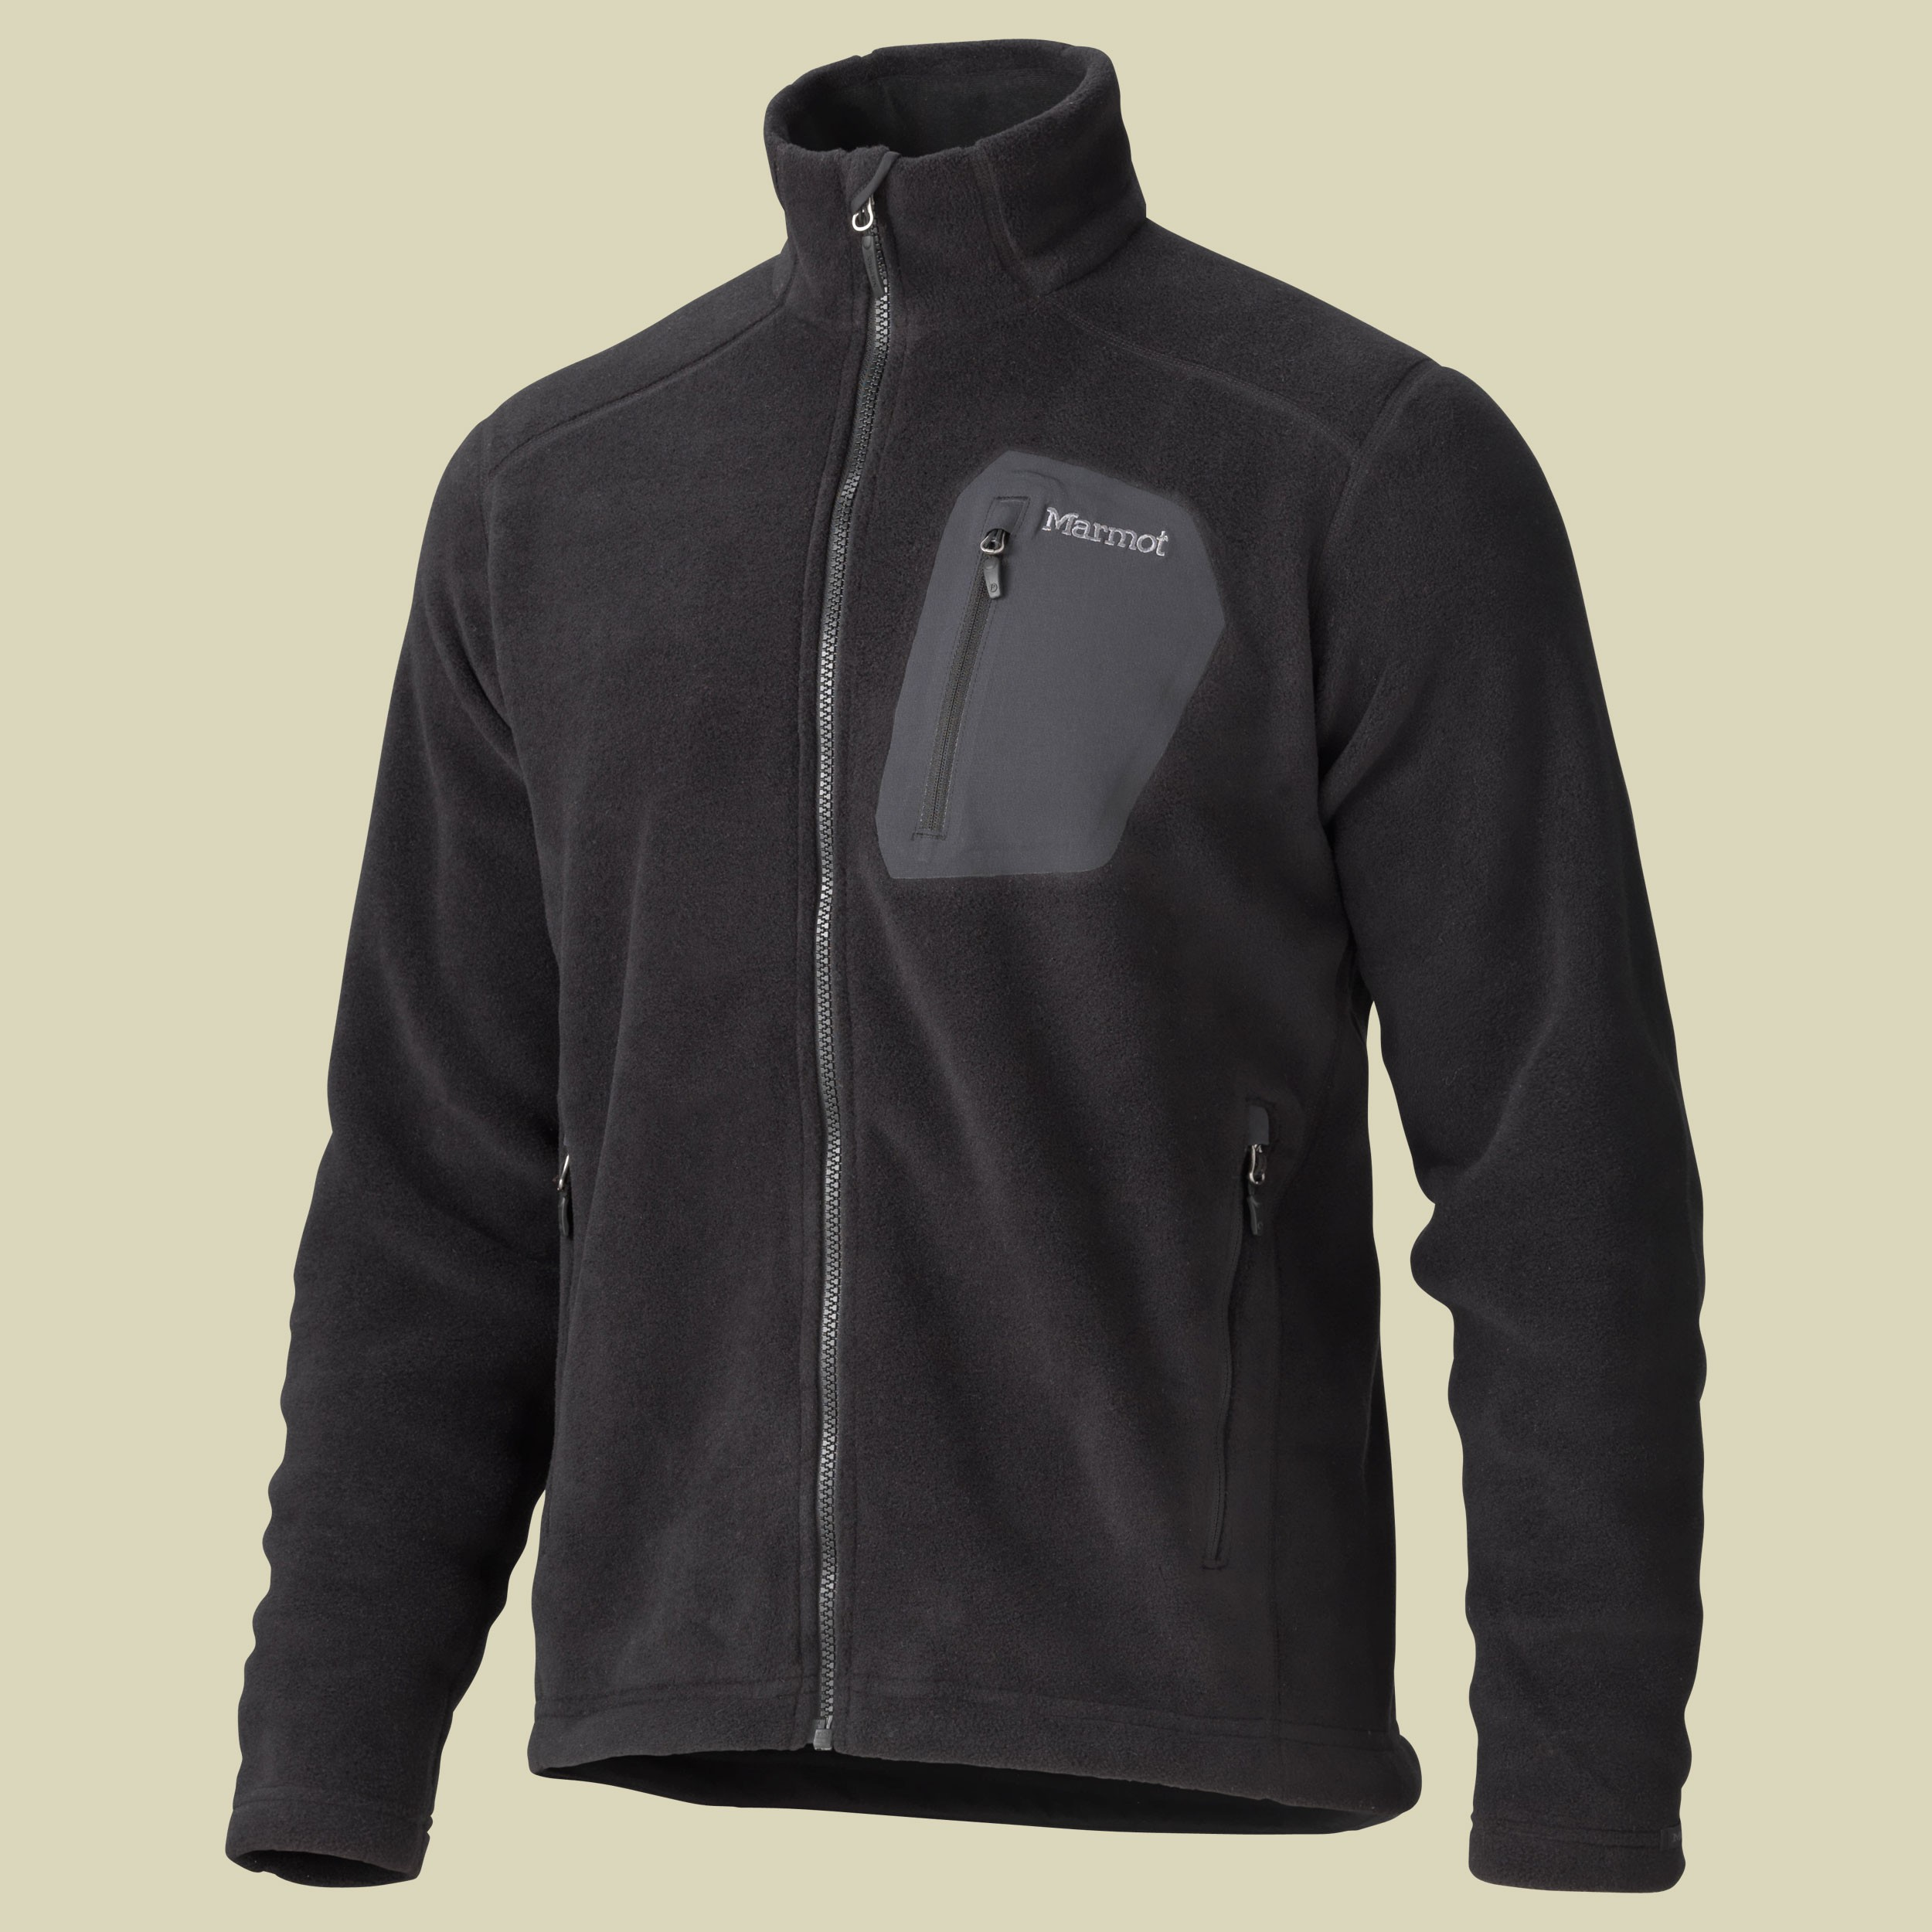 Warmlight Jacket Men